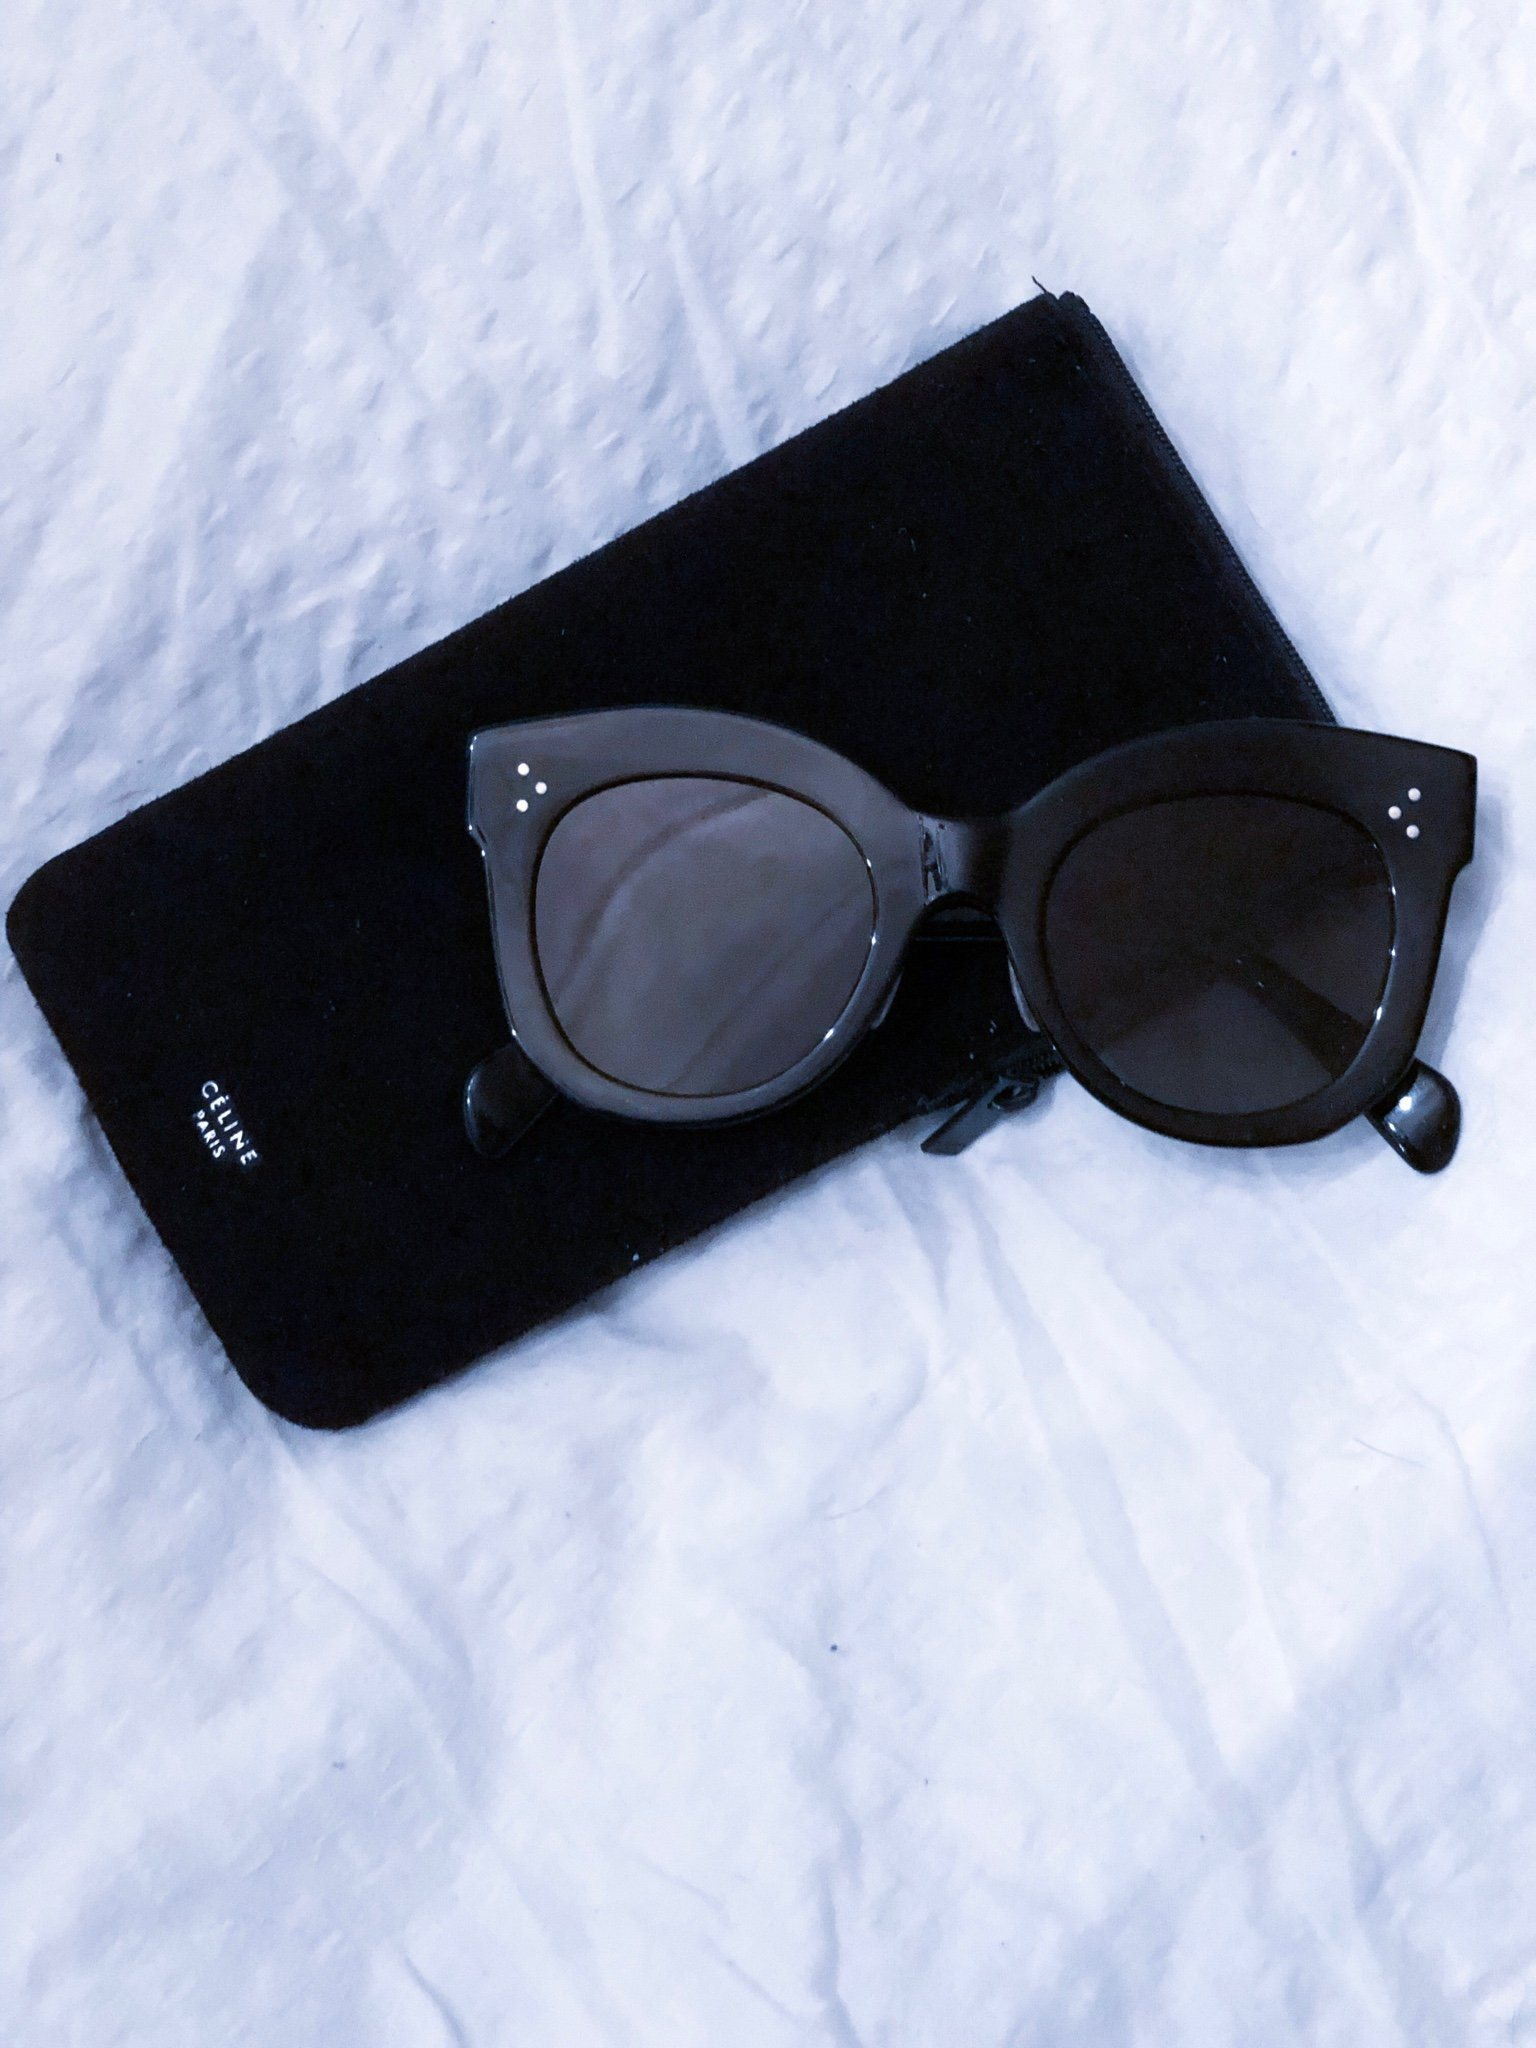 90e82e3f60f Celine solglasögon (338755447) ᐈ Köp på Tradera